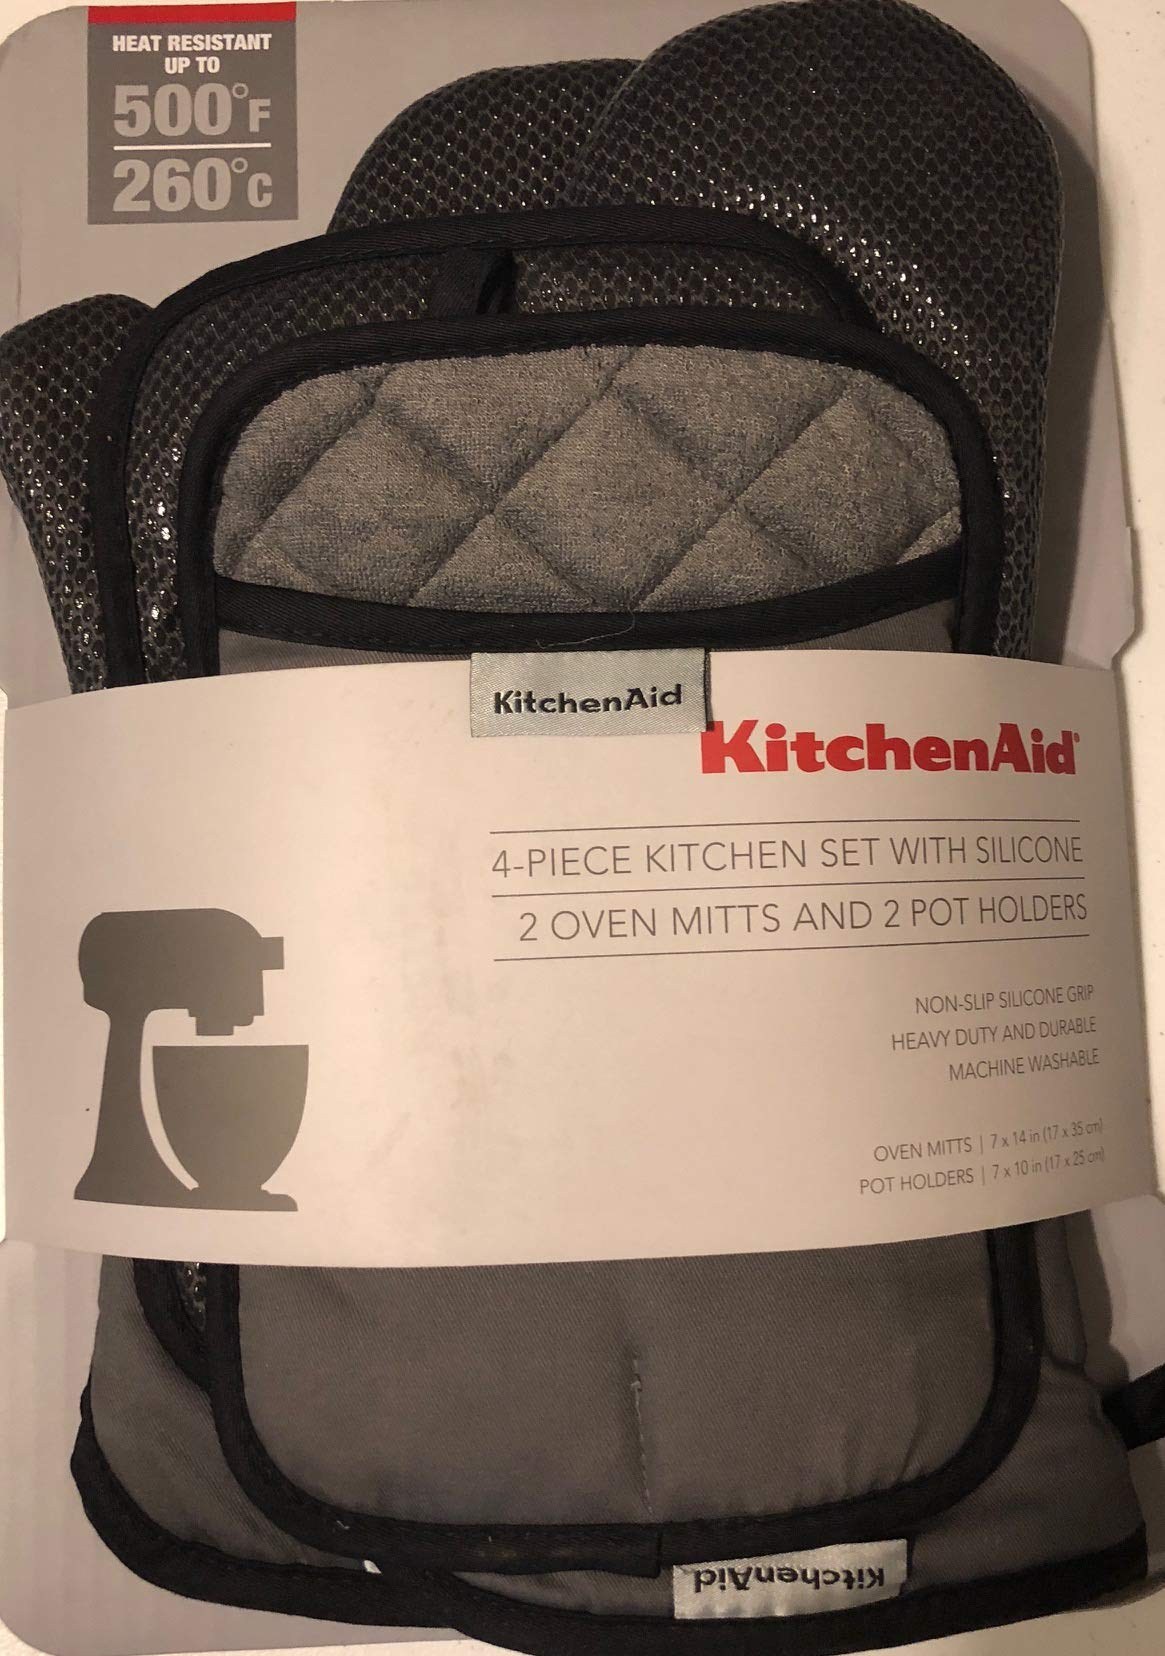 KitchenAid 4 Piece Kitchen Set w/Silicone 2 Oven Mitts, 2 Pot Holders (Grey)